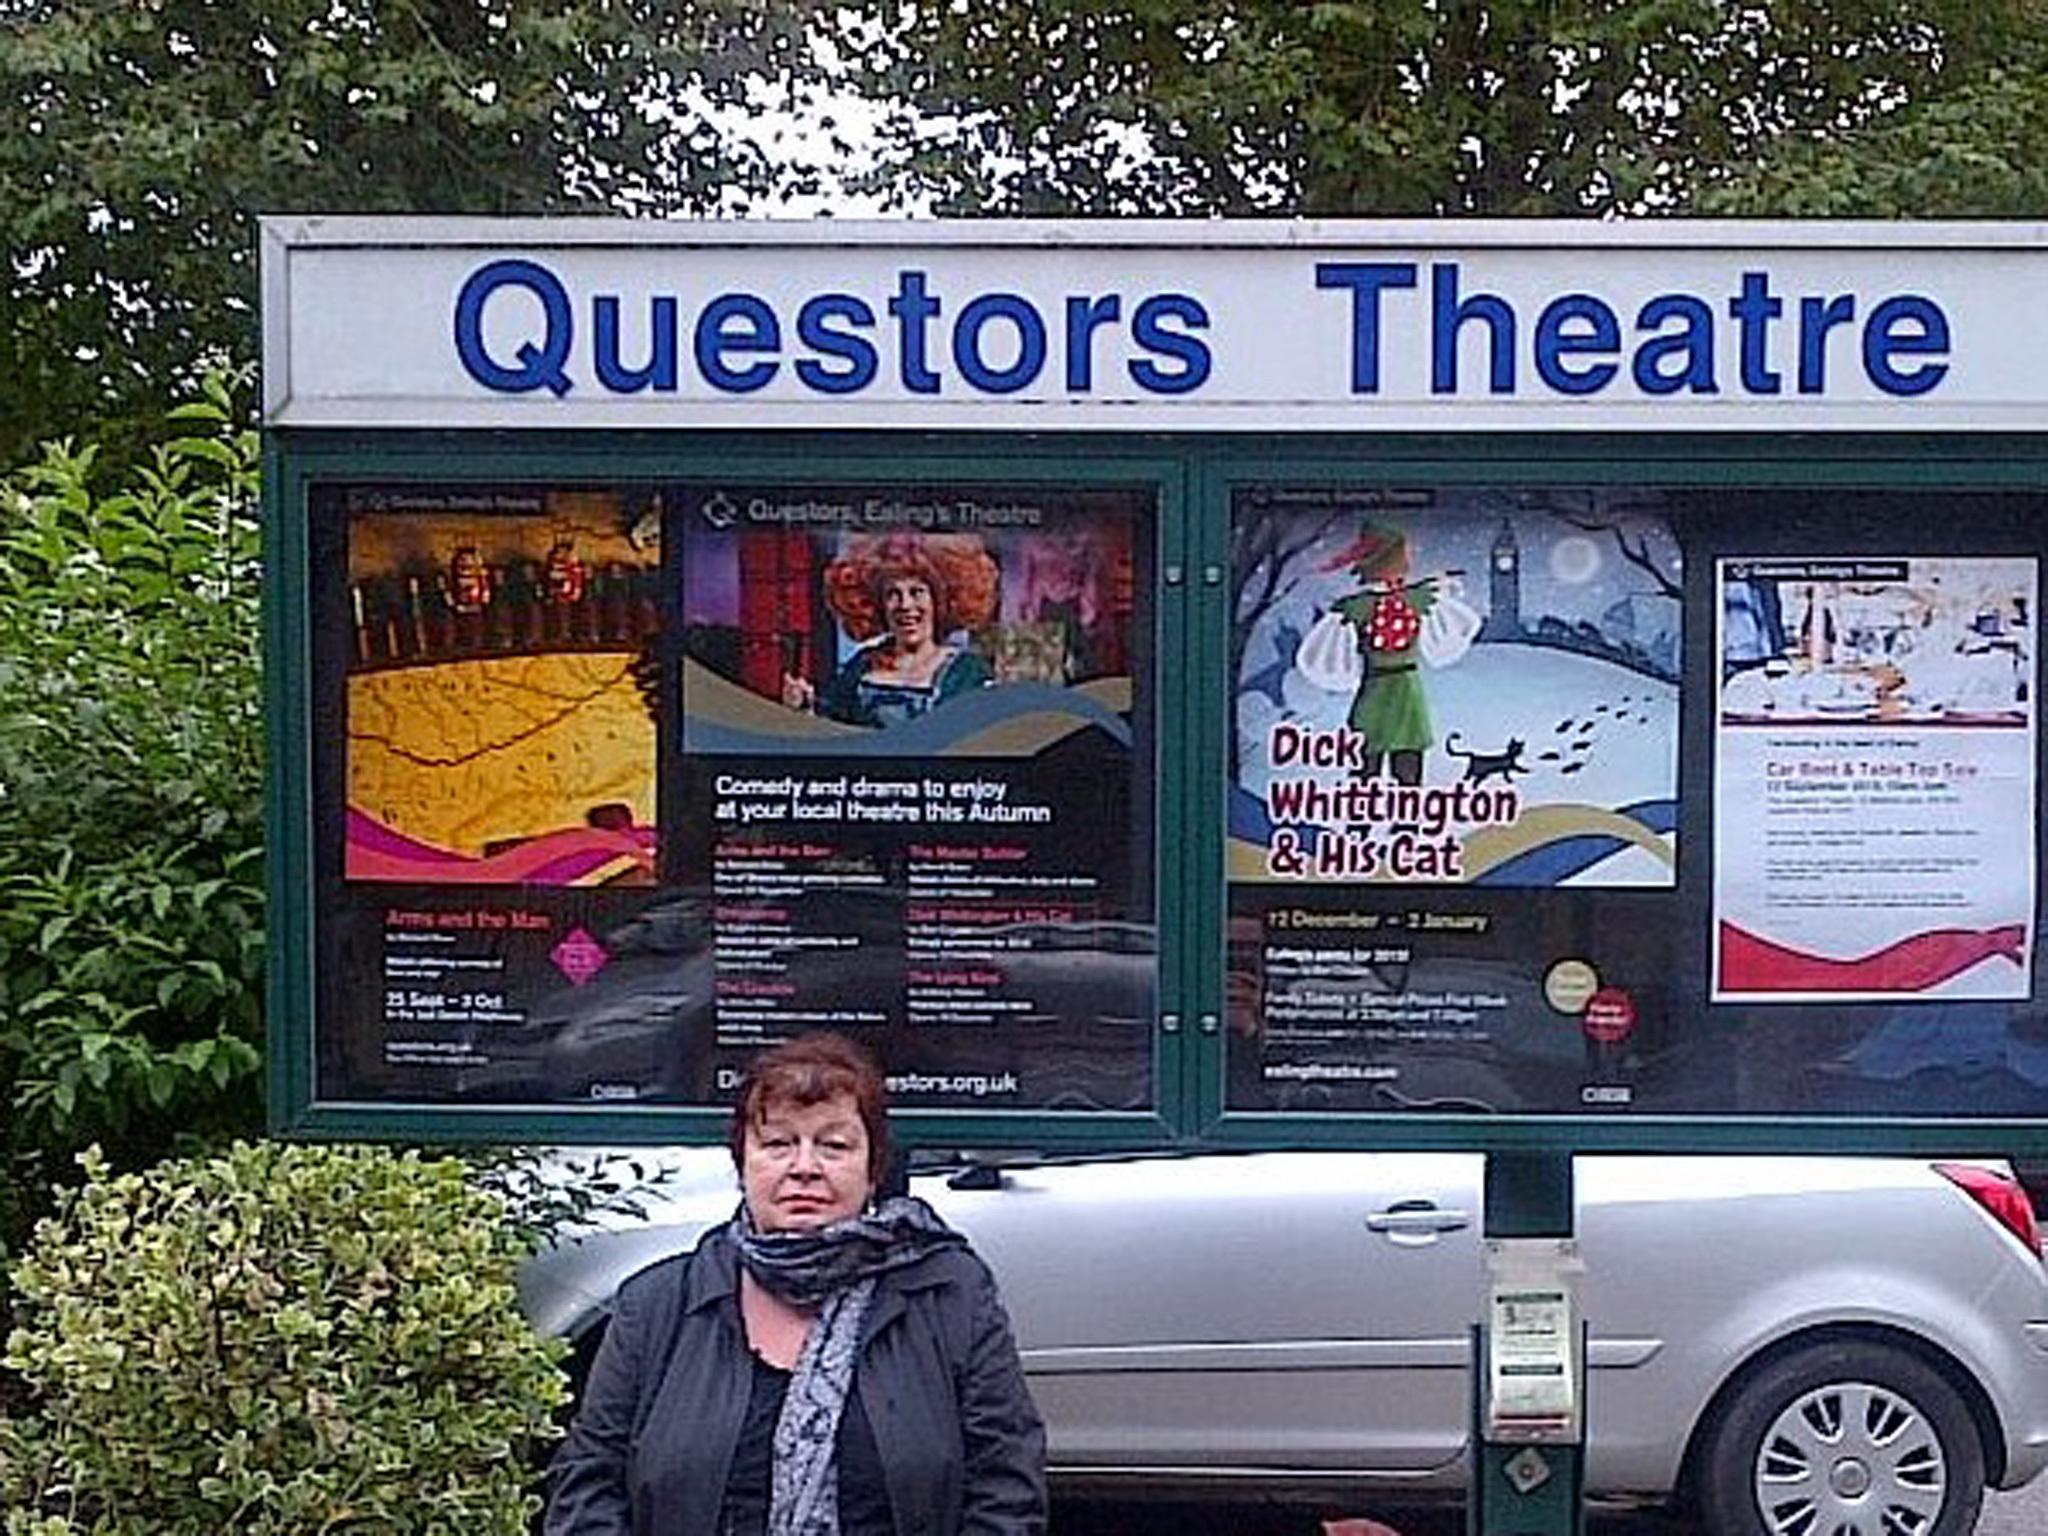 Eleanor Ransom on The Questors Theatre